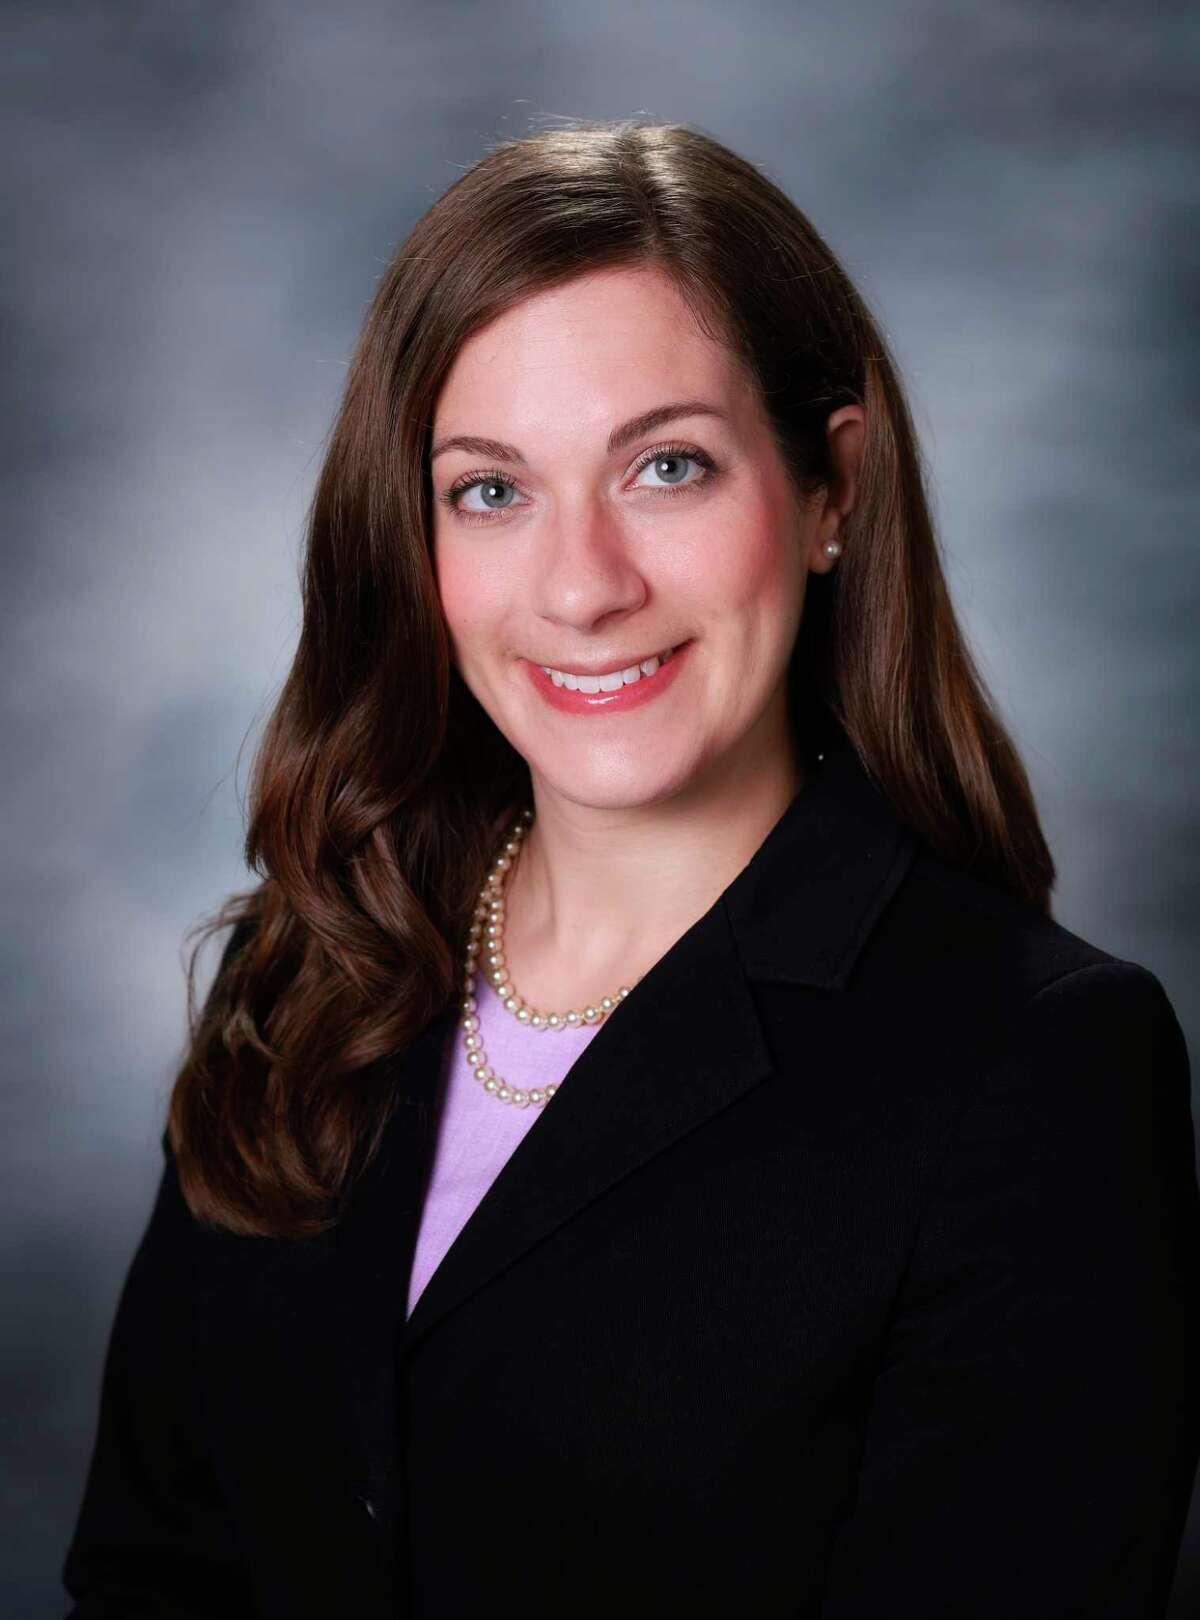 Cassandra Vogel